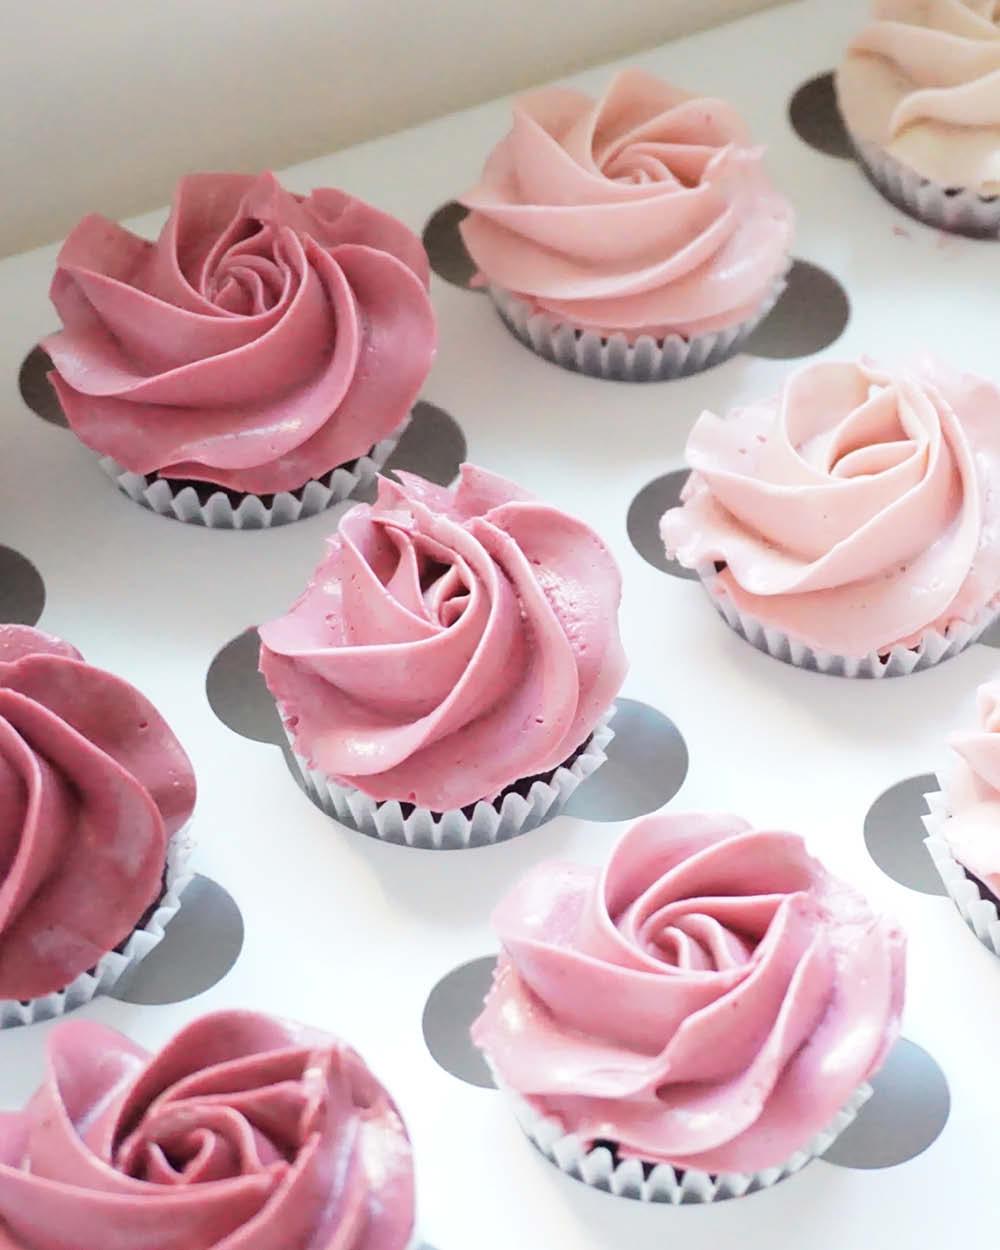 Cakes_By_Aranee_Perth_Drip_Cakes_Custom_Cakes_Wedding_Cakes_Macarons_Cupcakes_Personalised_Cookies_OTHER_DESSERTS_Gallery12.jpg